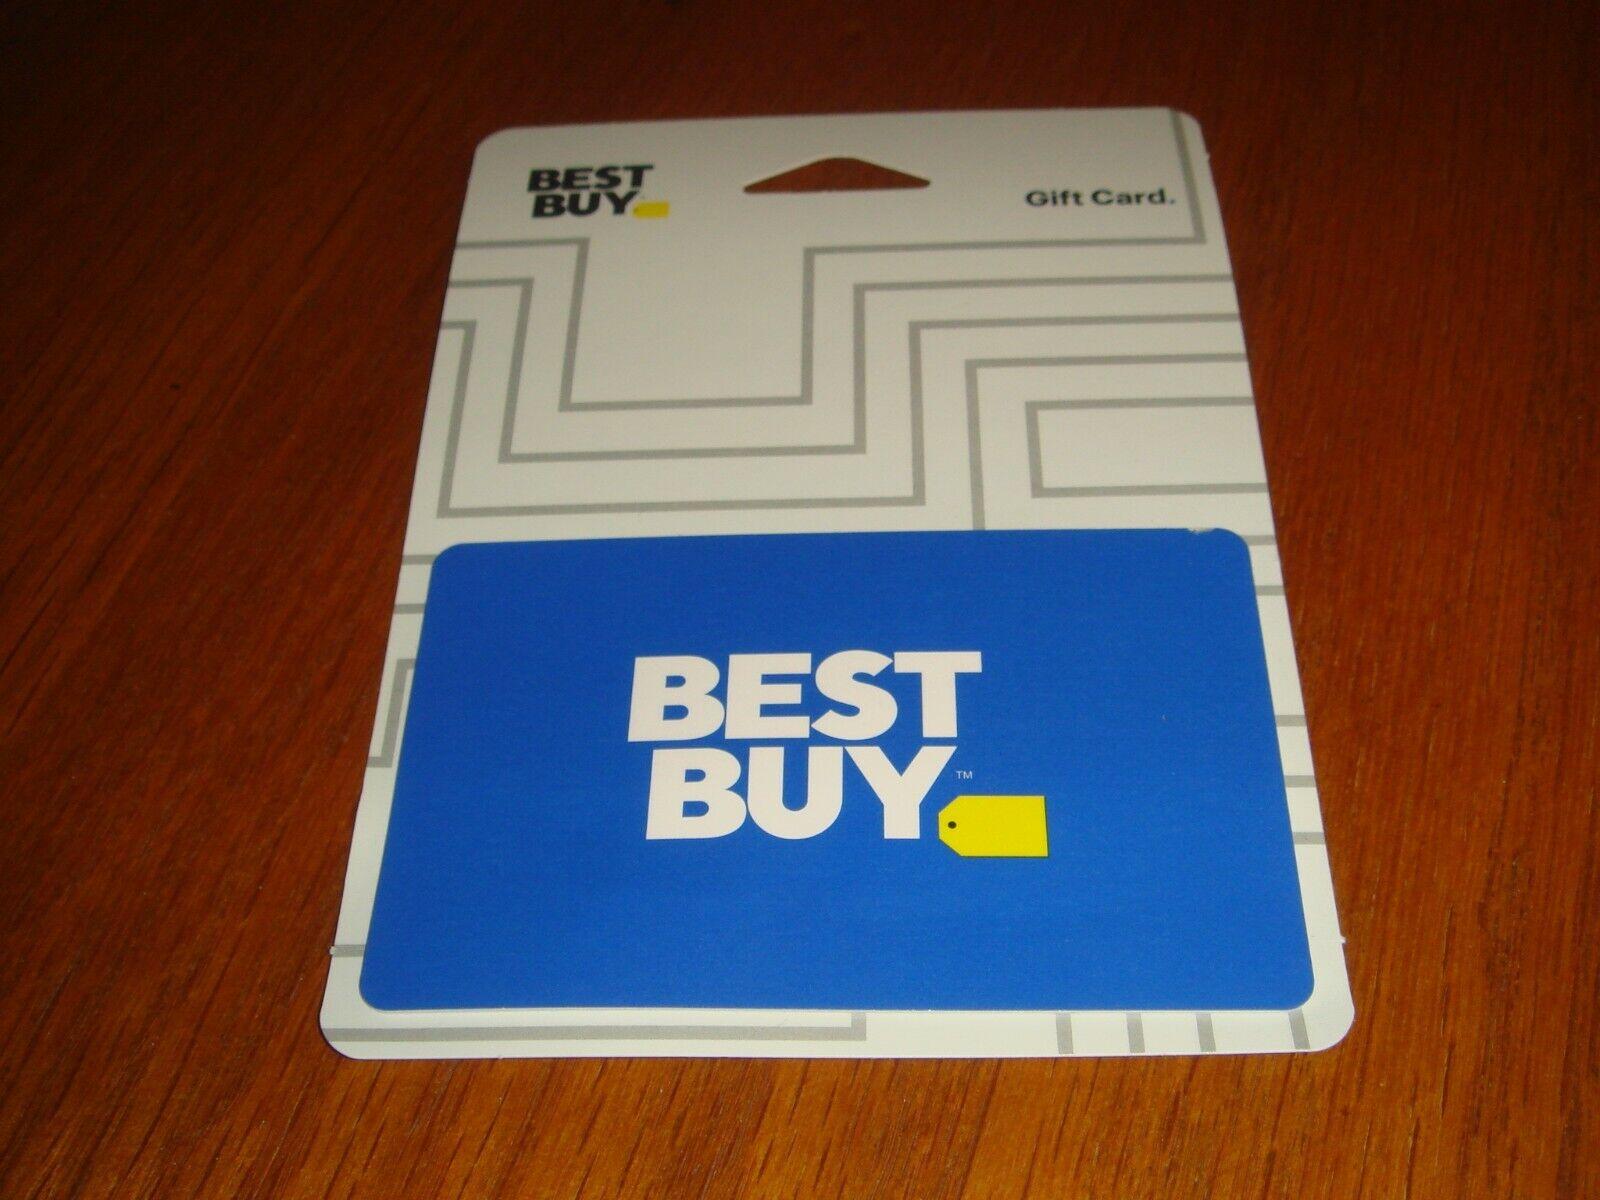 200 Best Buy Gift Card - $182.50